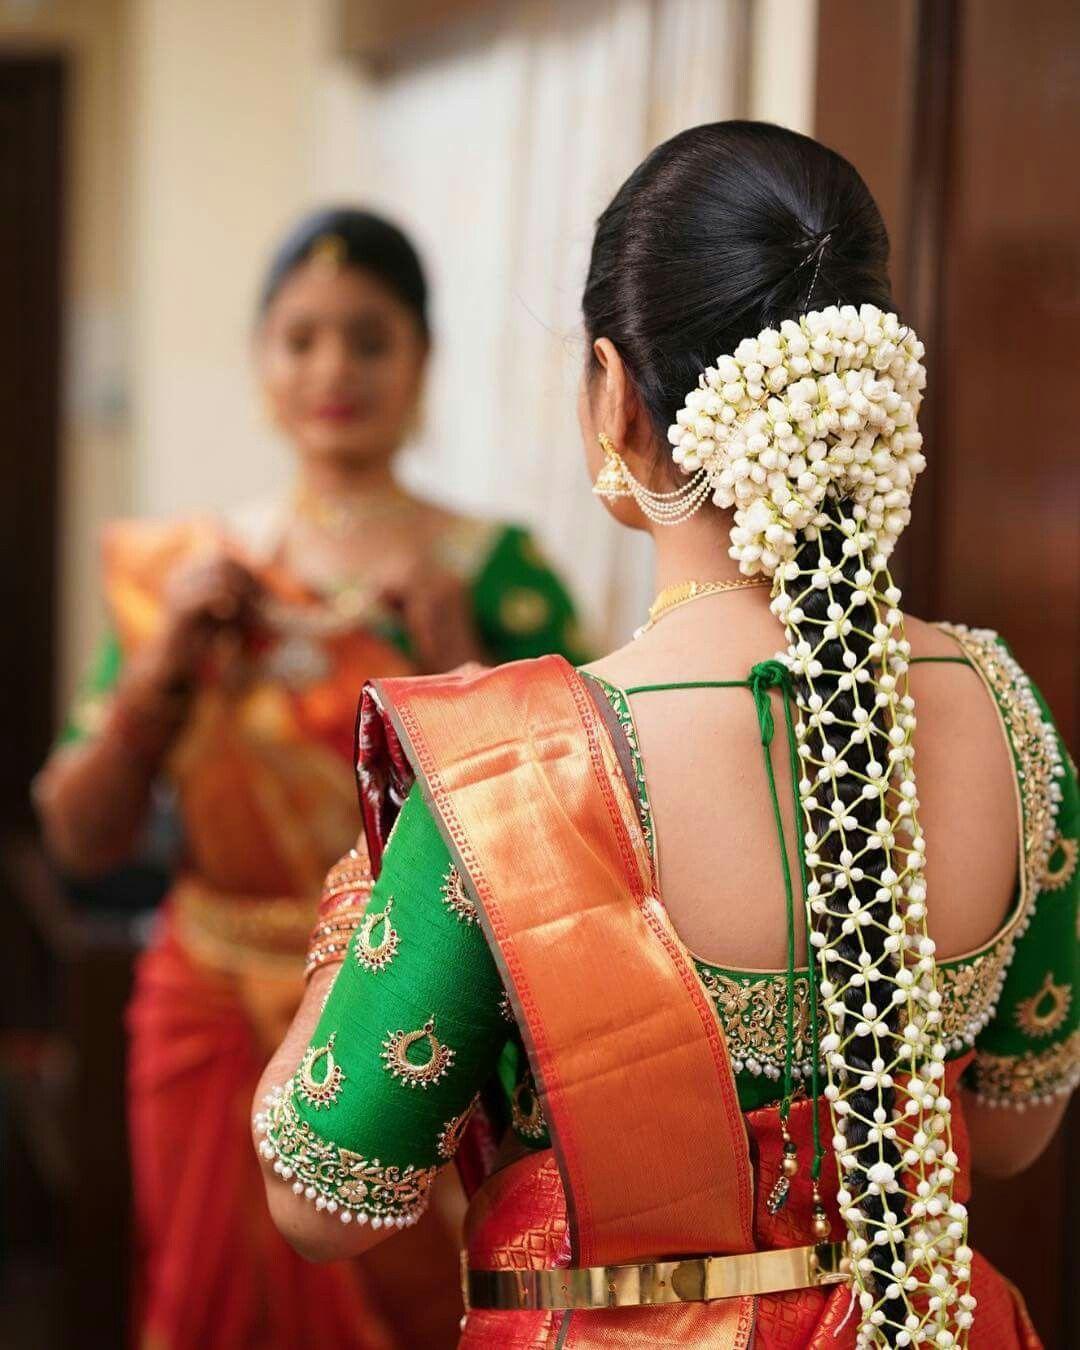 pin by anitha on jada alagaram in 2019 | wedding hair clips